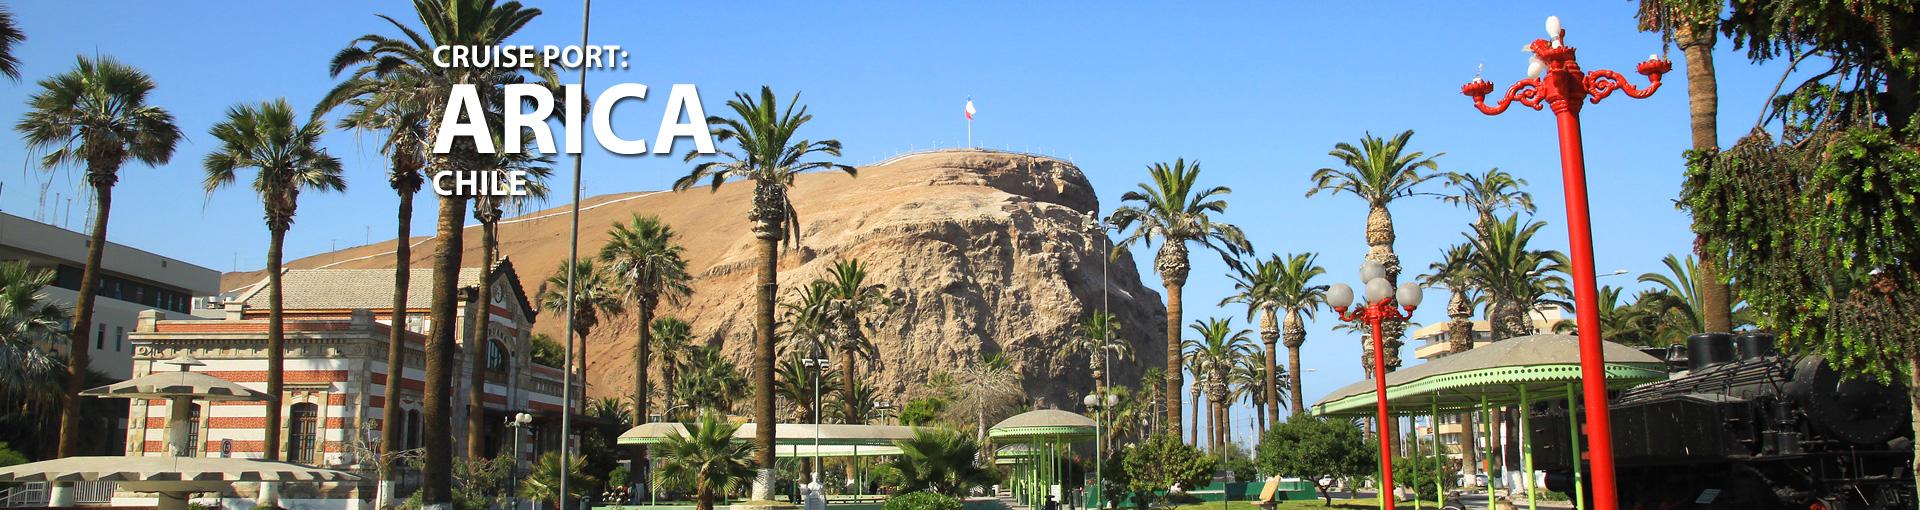 Cruises to Arica, Chile